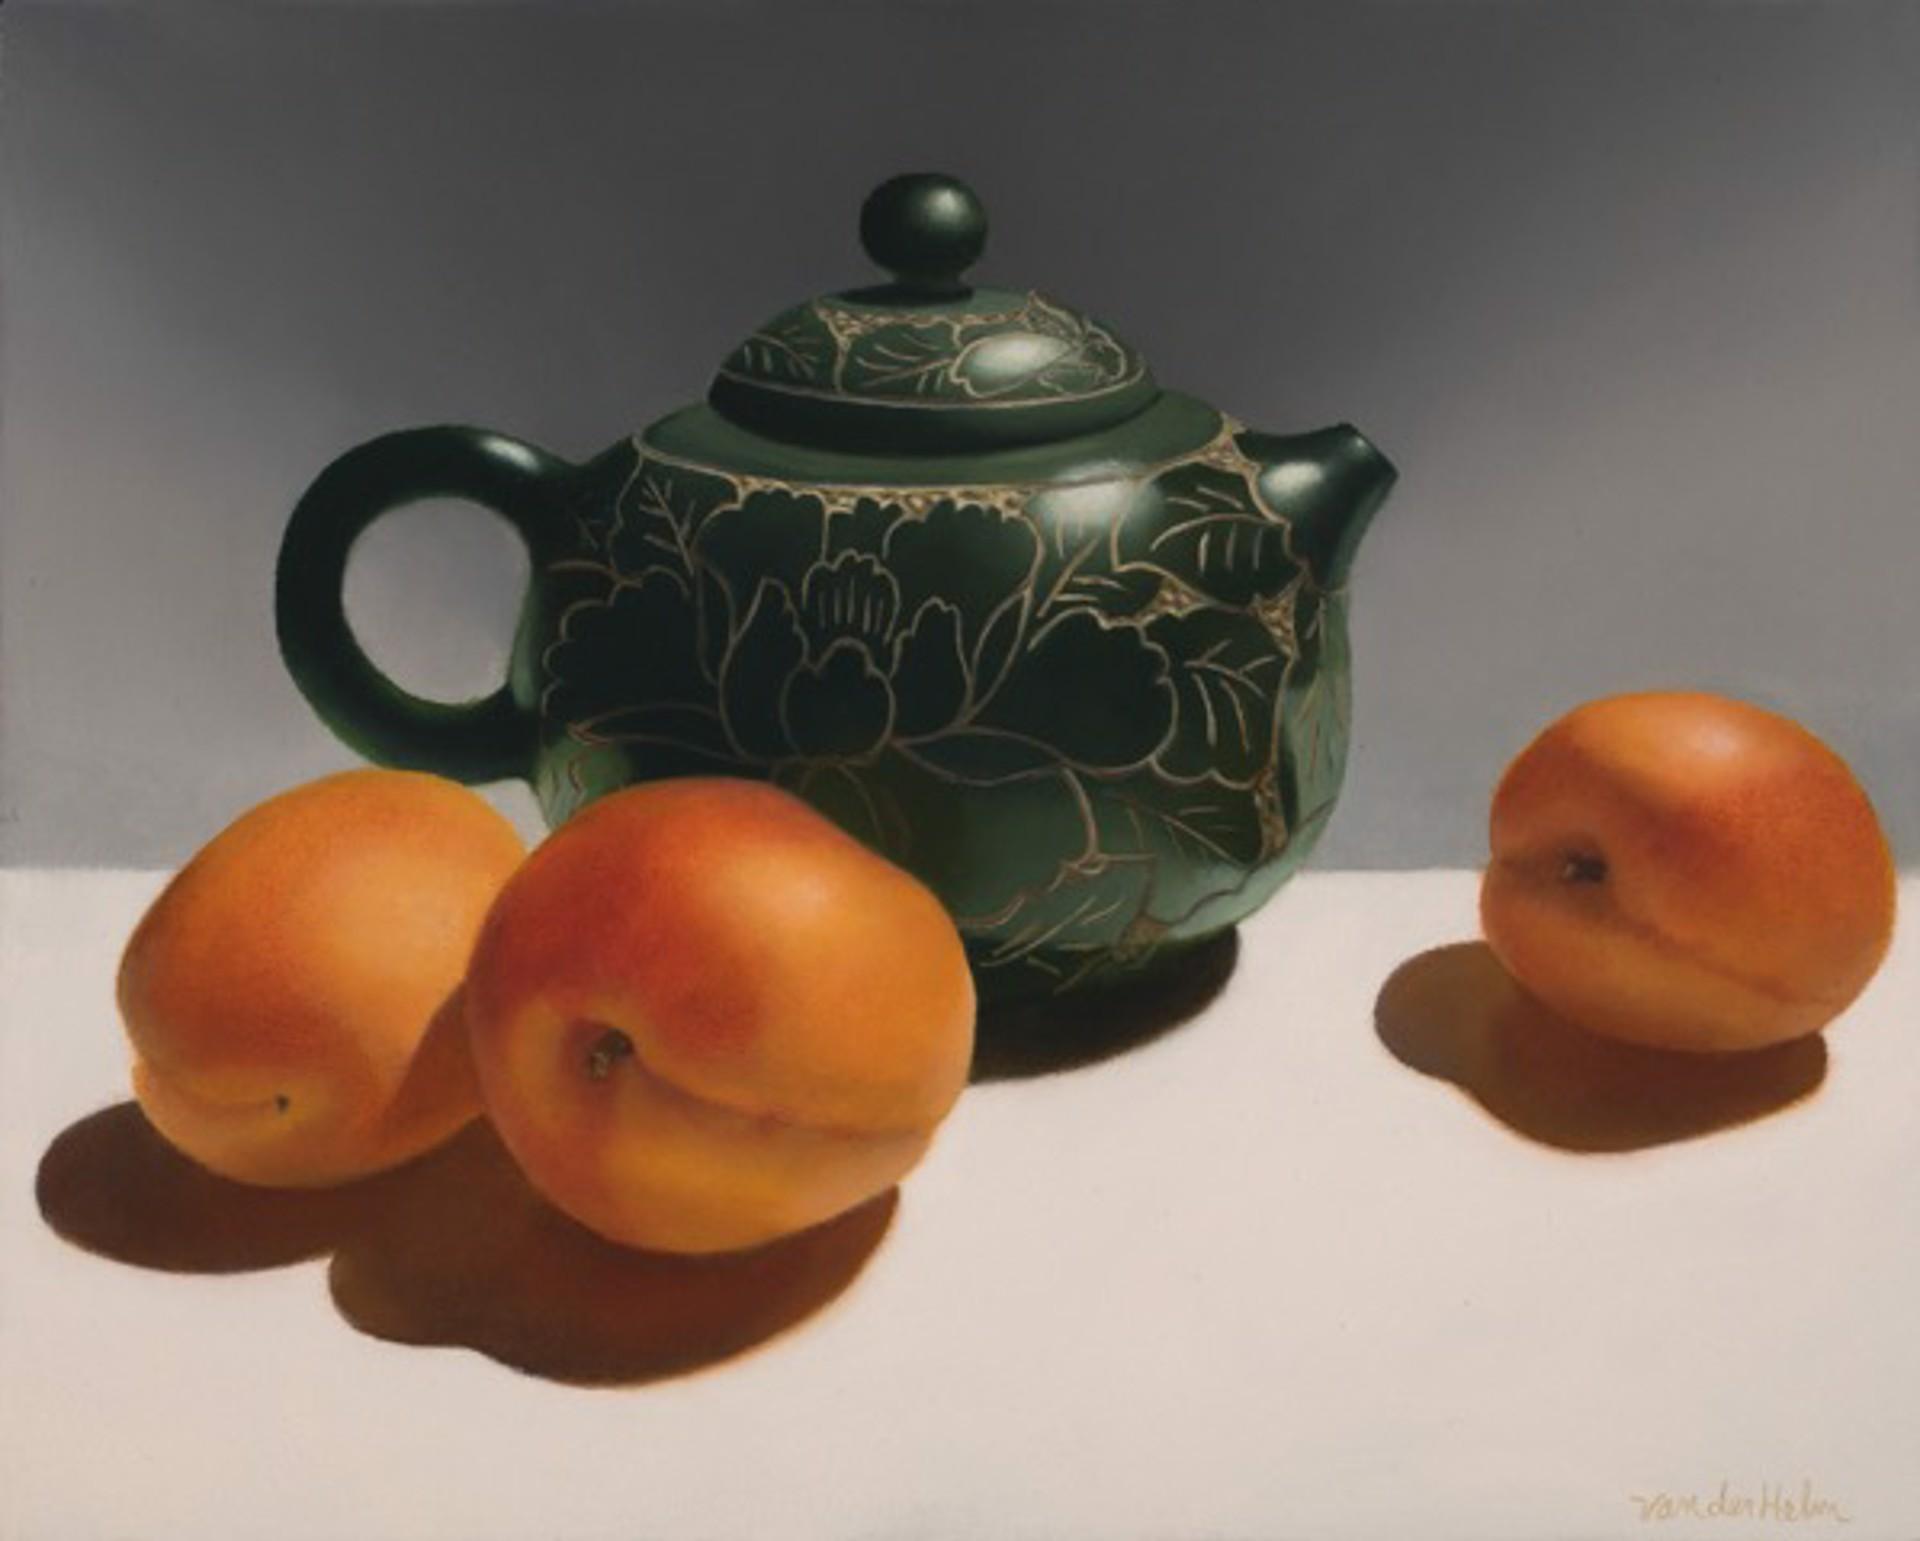 Teapot with Apricots by Sarah van der Helm